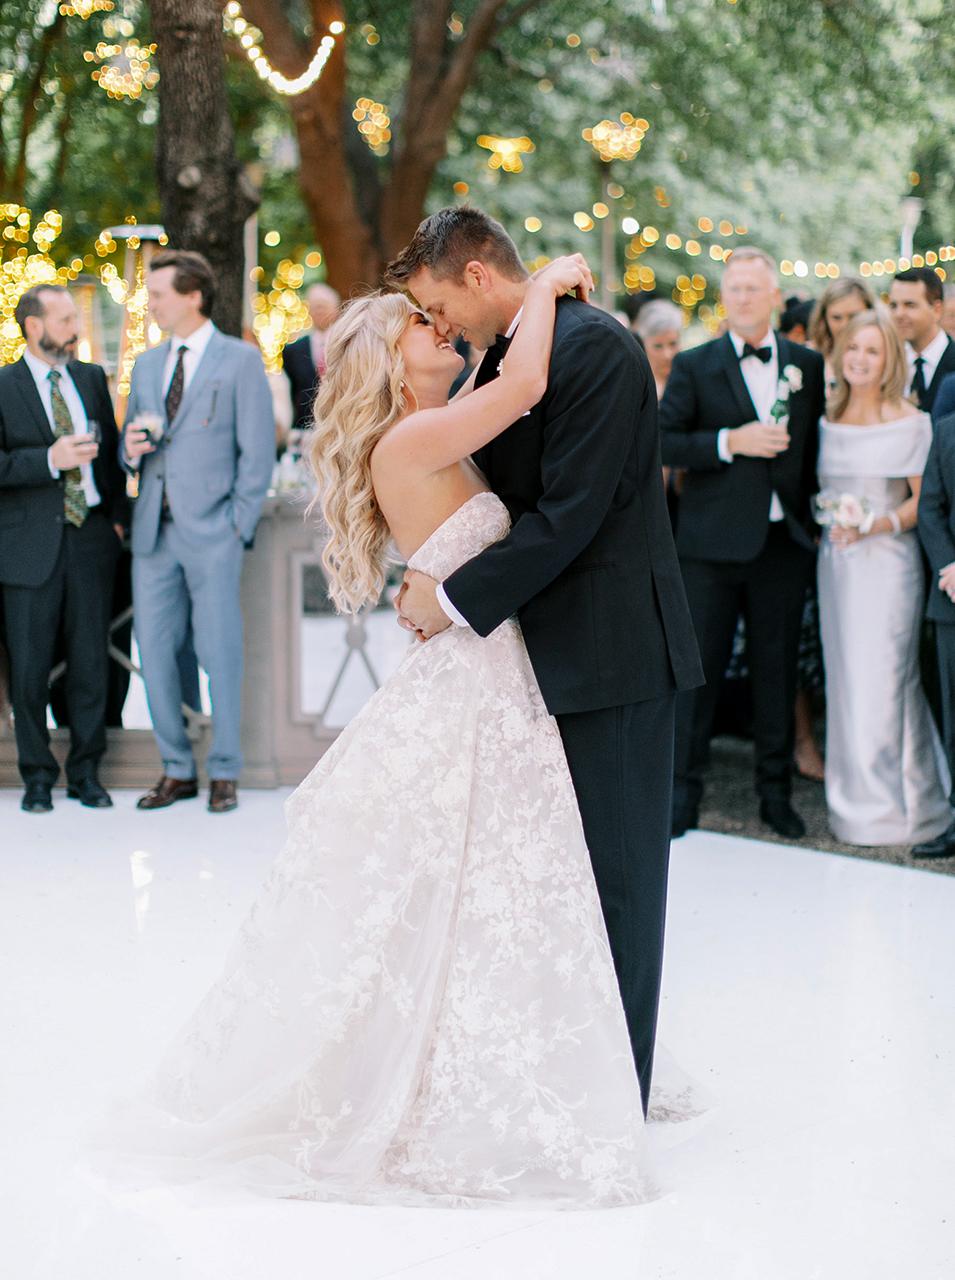 bride groom first dance outdoors white floor